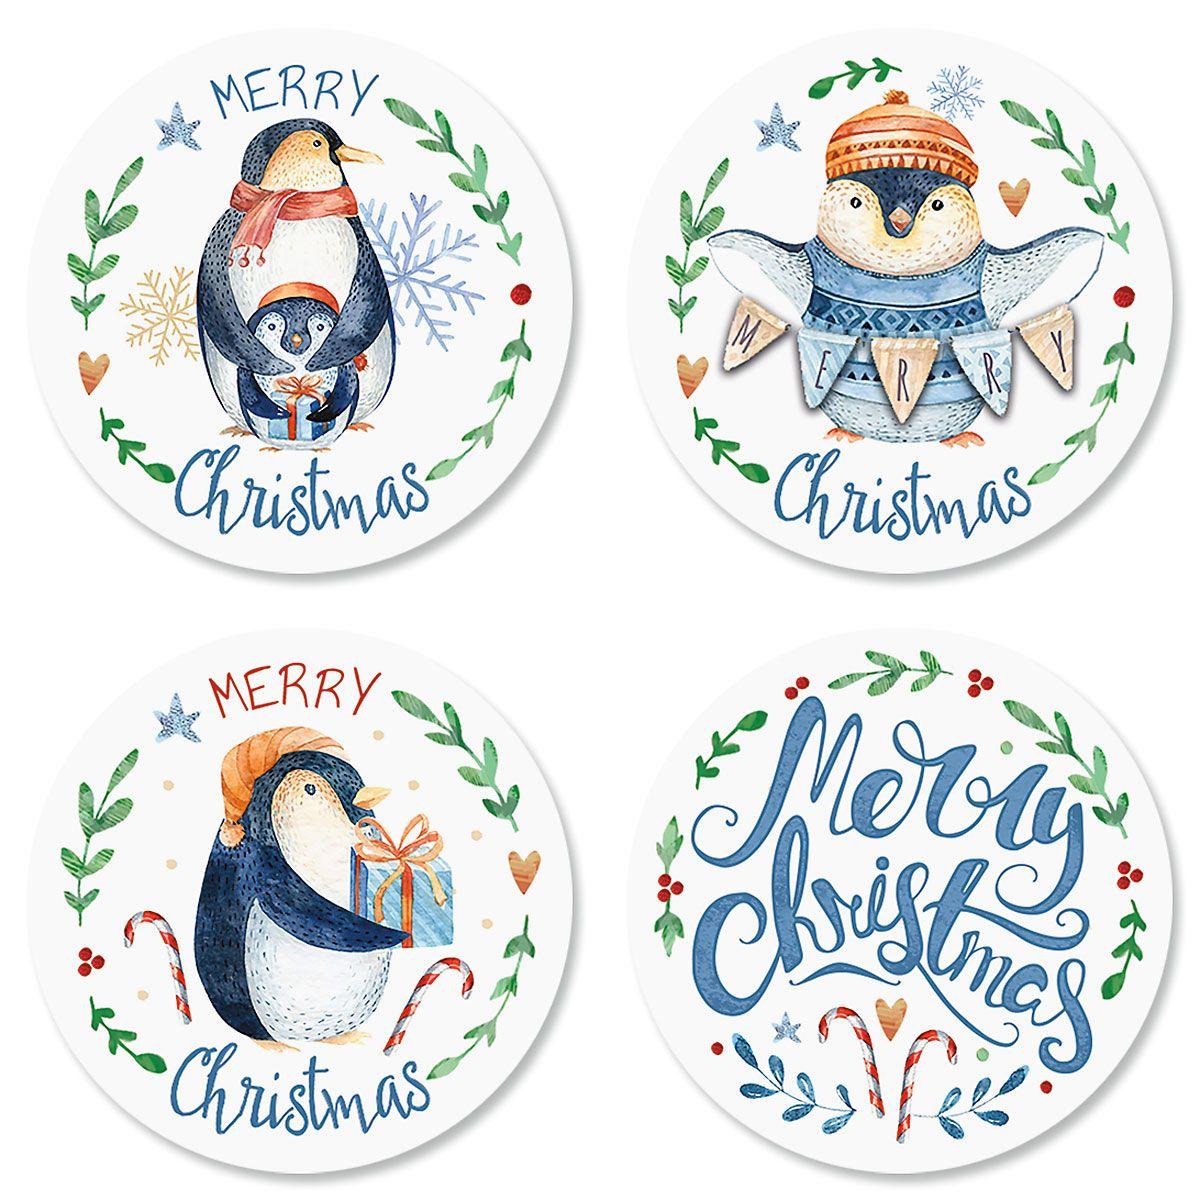 Merry Penguins Envelope Seals (4 Designs)